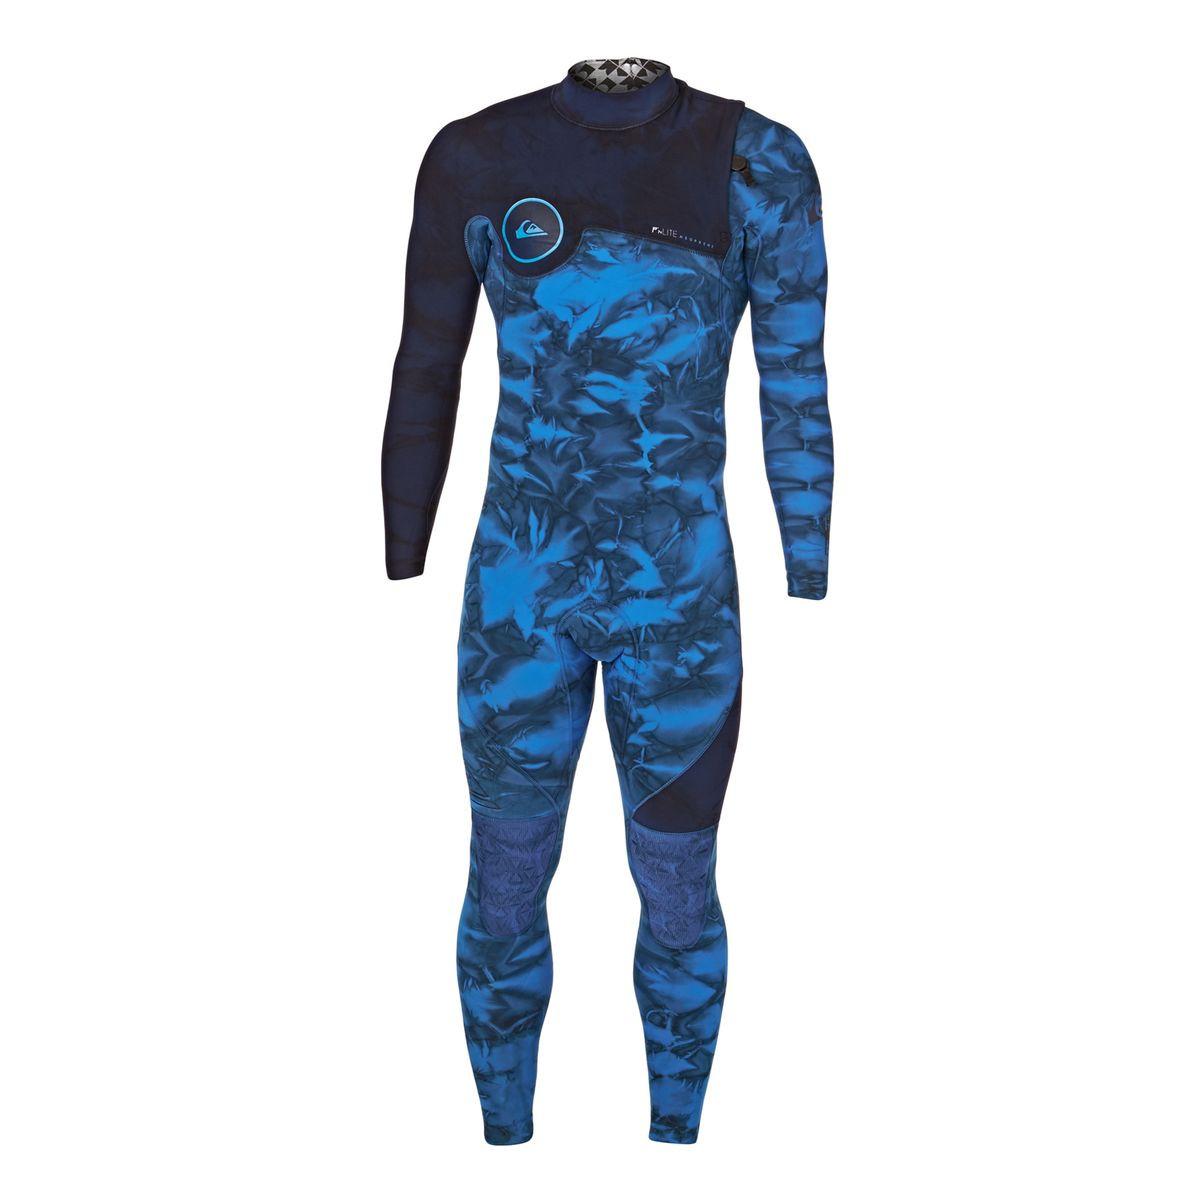 Quiksilver Highline Dye Capsule 3/2mm 2017 Zipperless Wetsuit - Navy Blazer